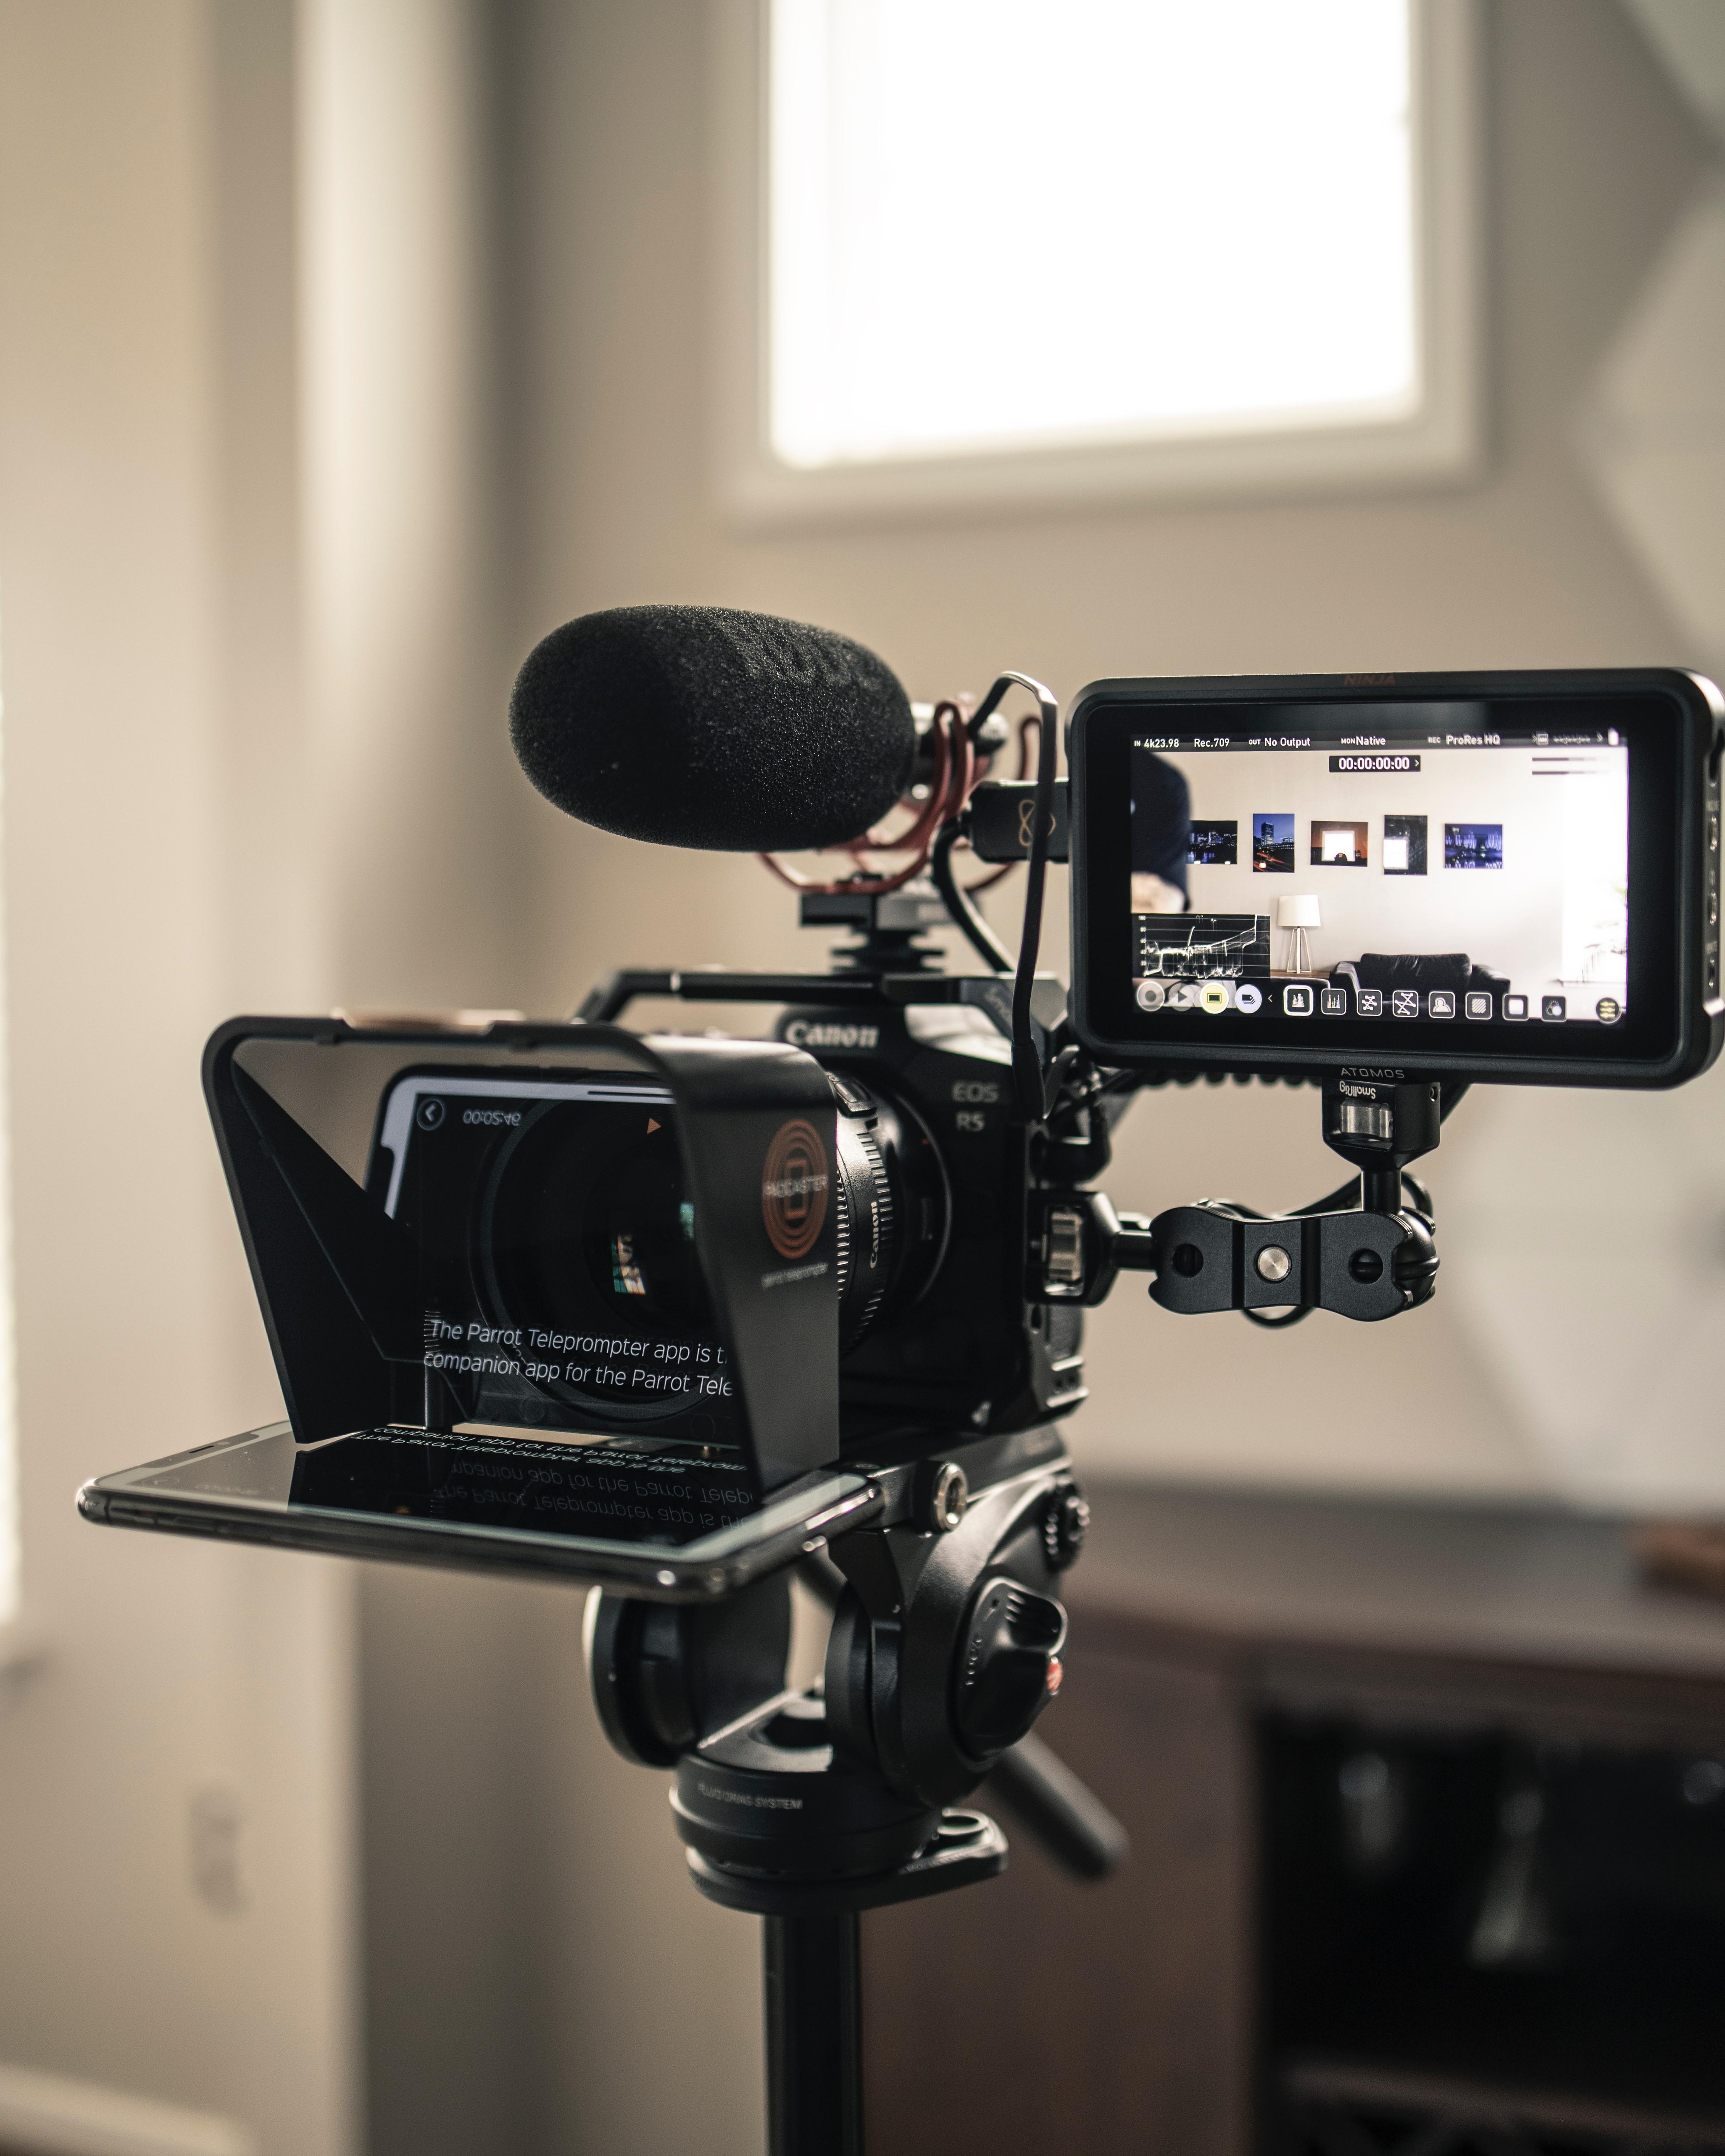 720 videography